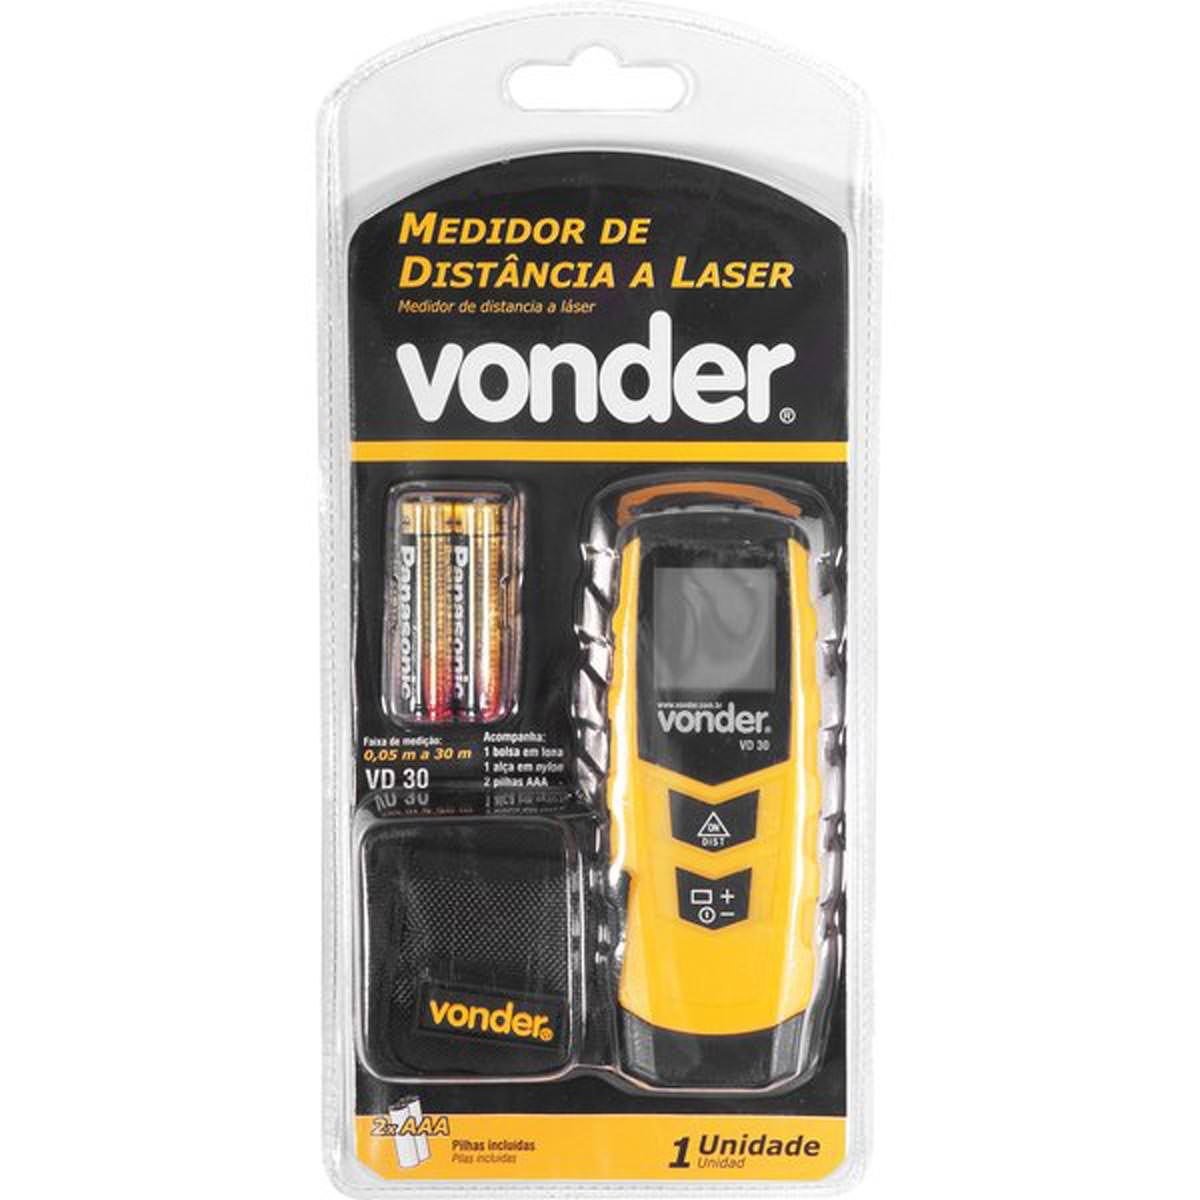 Trena À Laser Vonder 0,05m À 30m Vd 30 Medidor De Distância